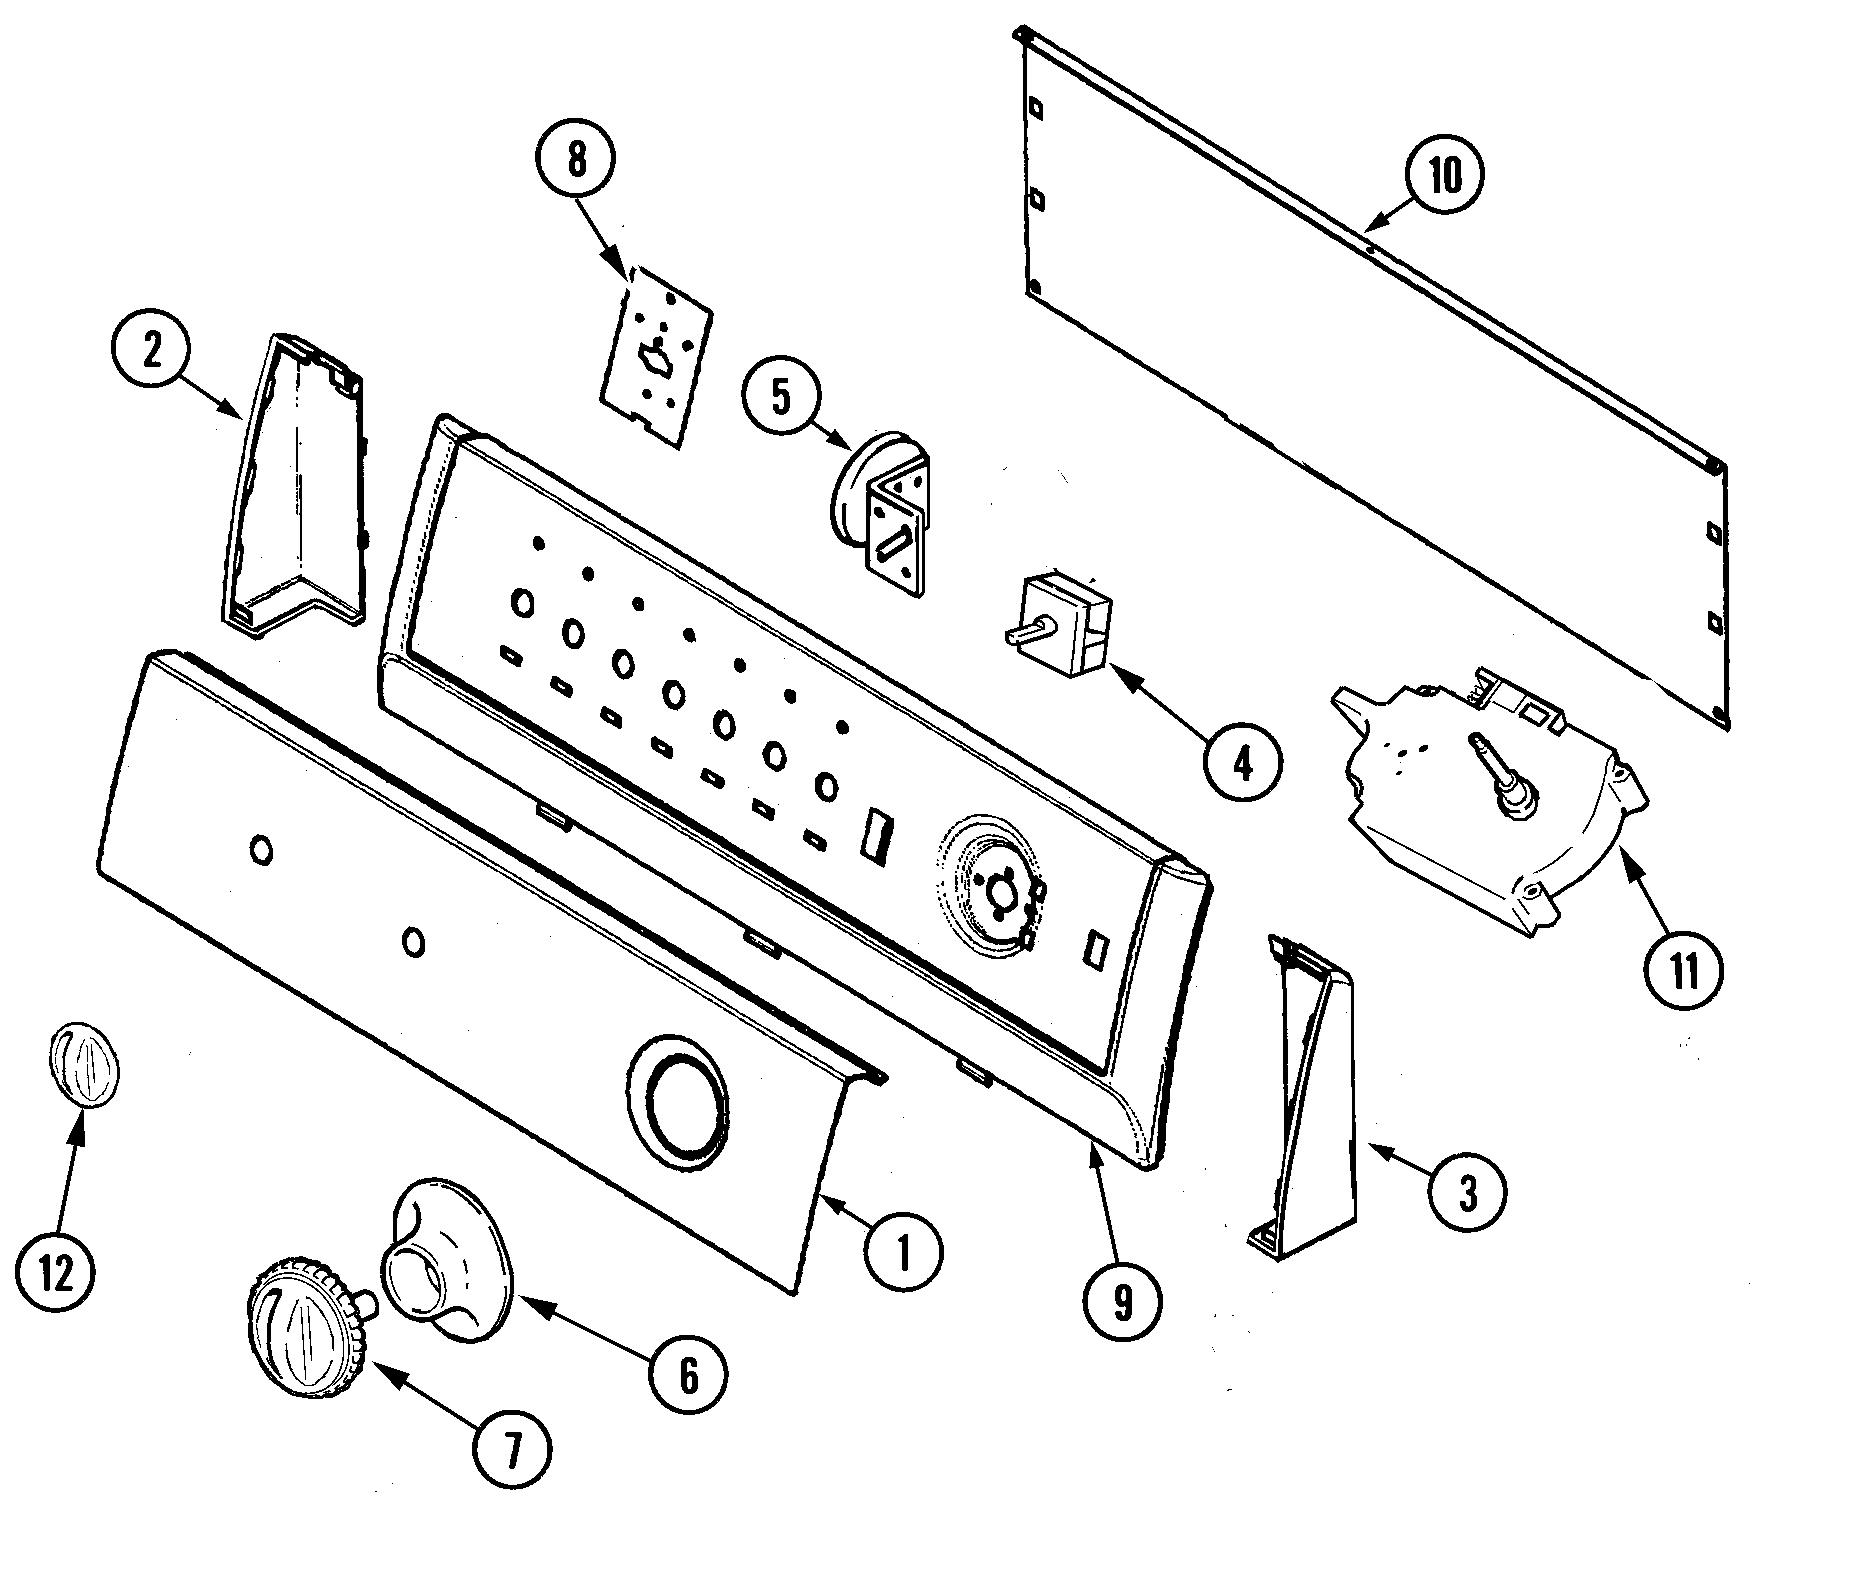 kenmore elite dishwasher wiring diagram 2006 subaru impreza ignition washing machine: admiral machine parts